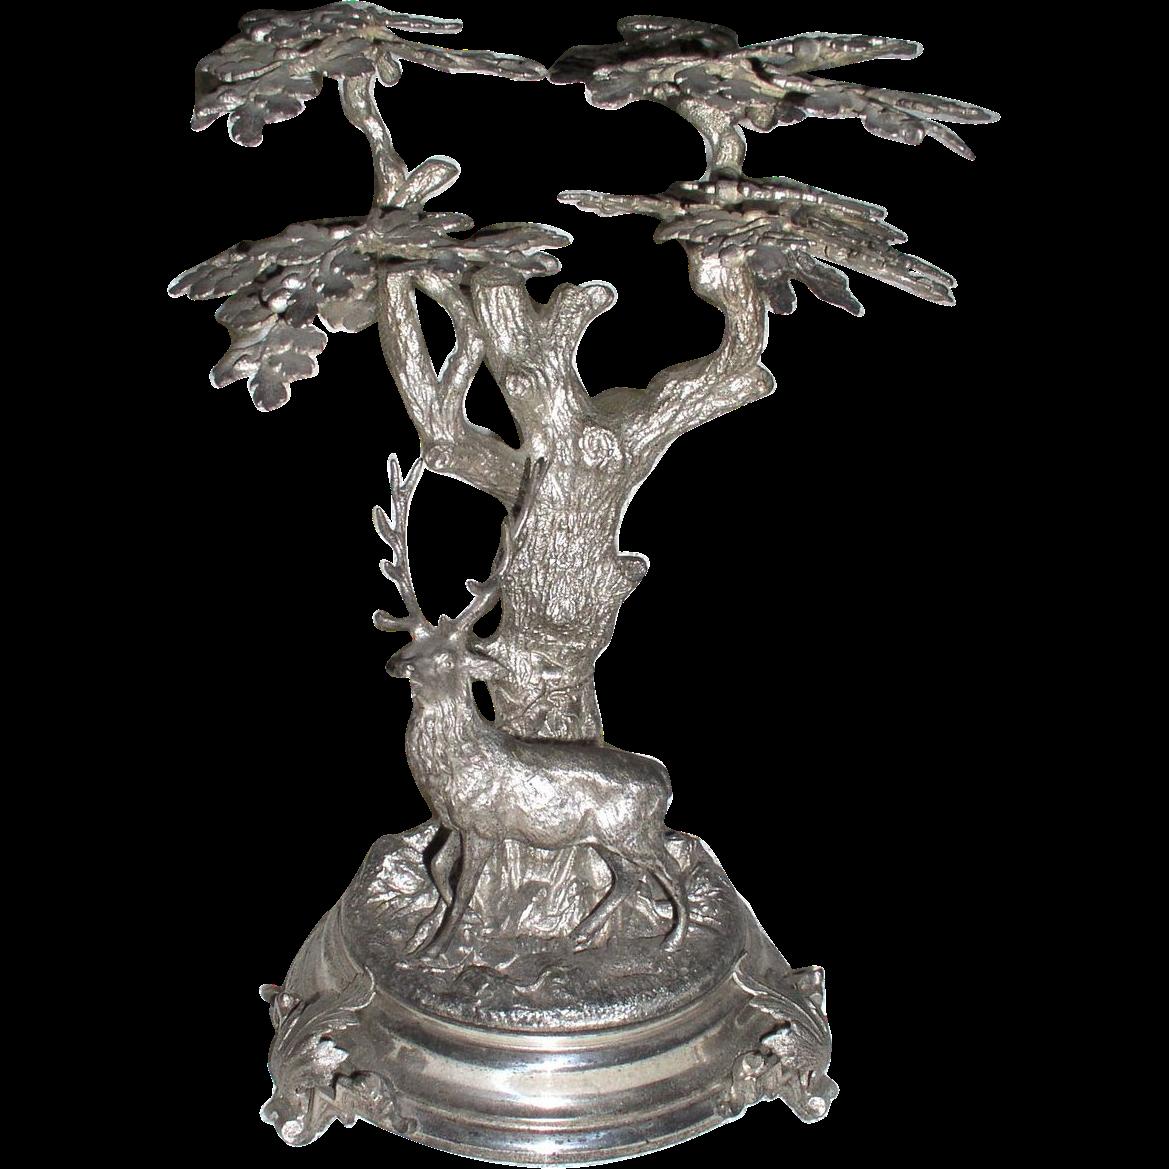 Victorian Era Metal Centerpiece Deer Under a Tree